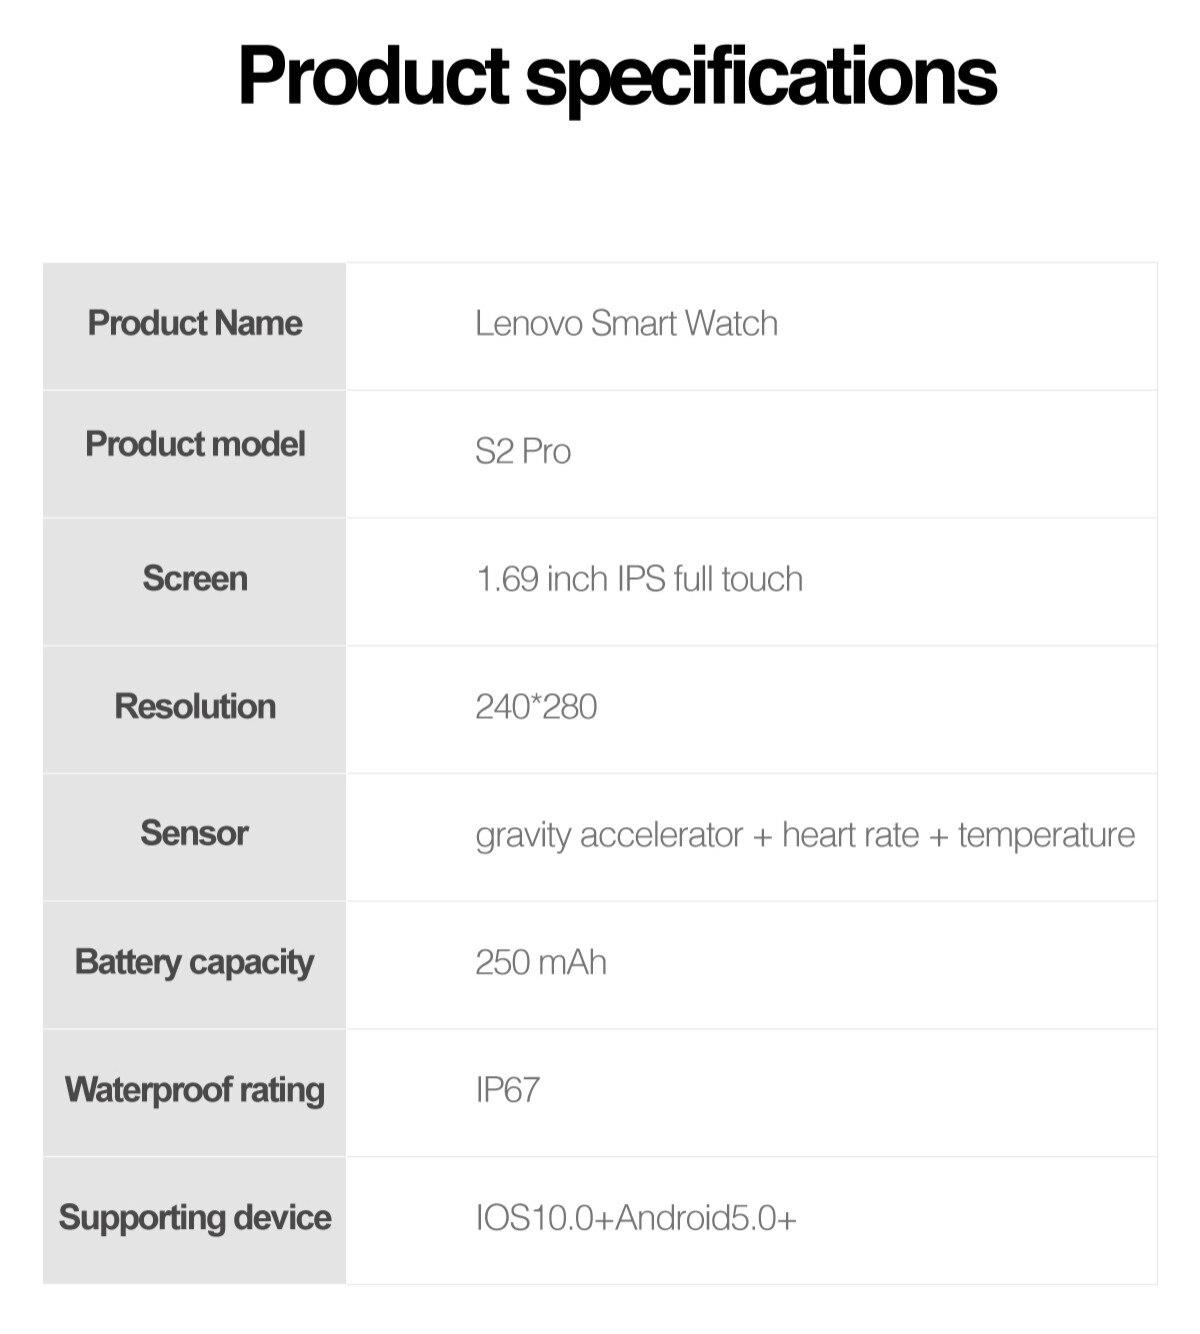 2021 lenovo s2 pro smartwatch 1.69 hd